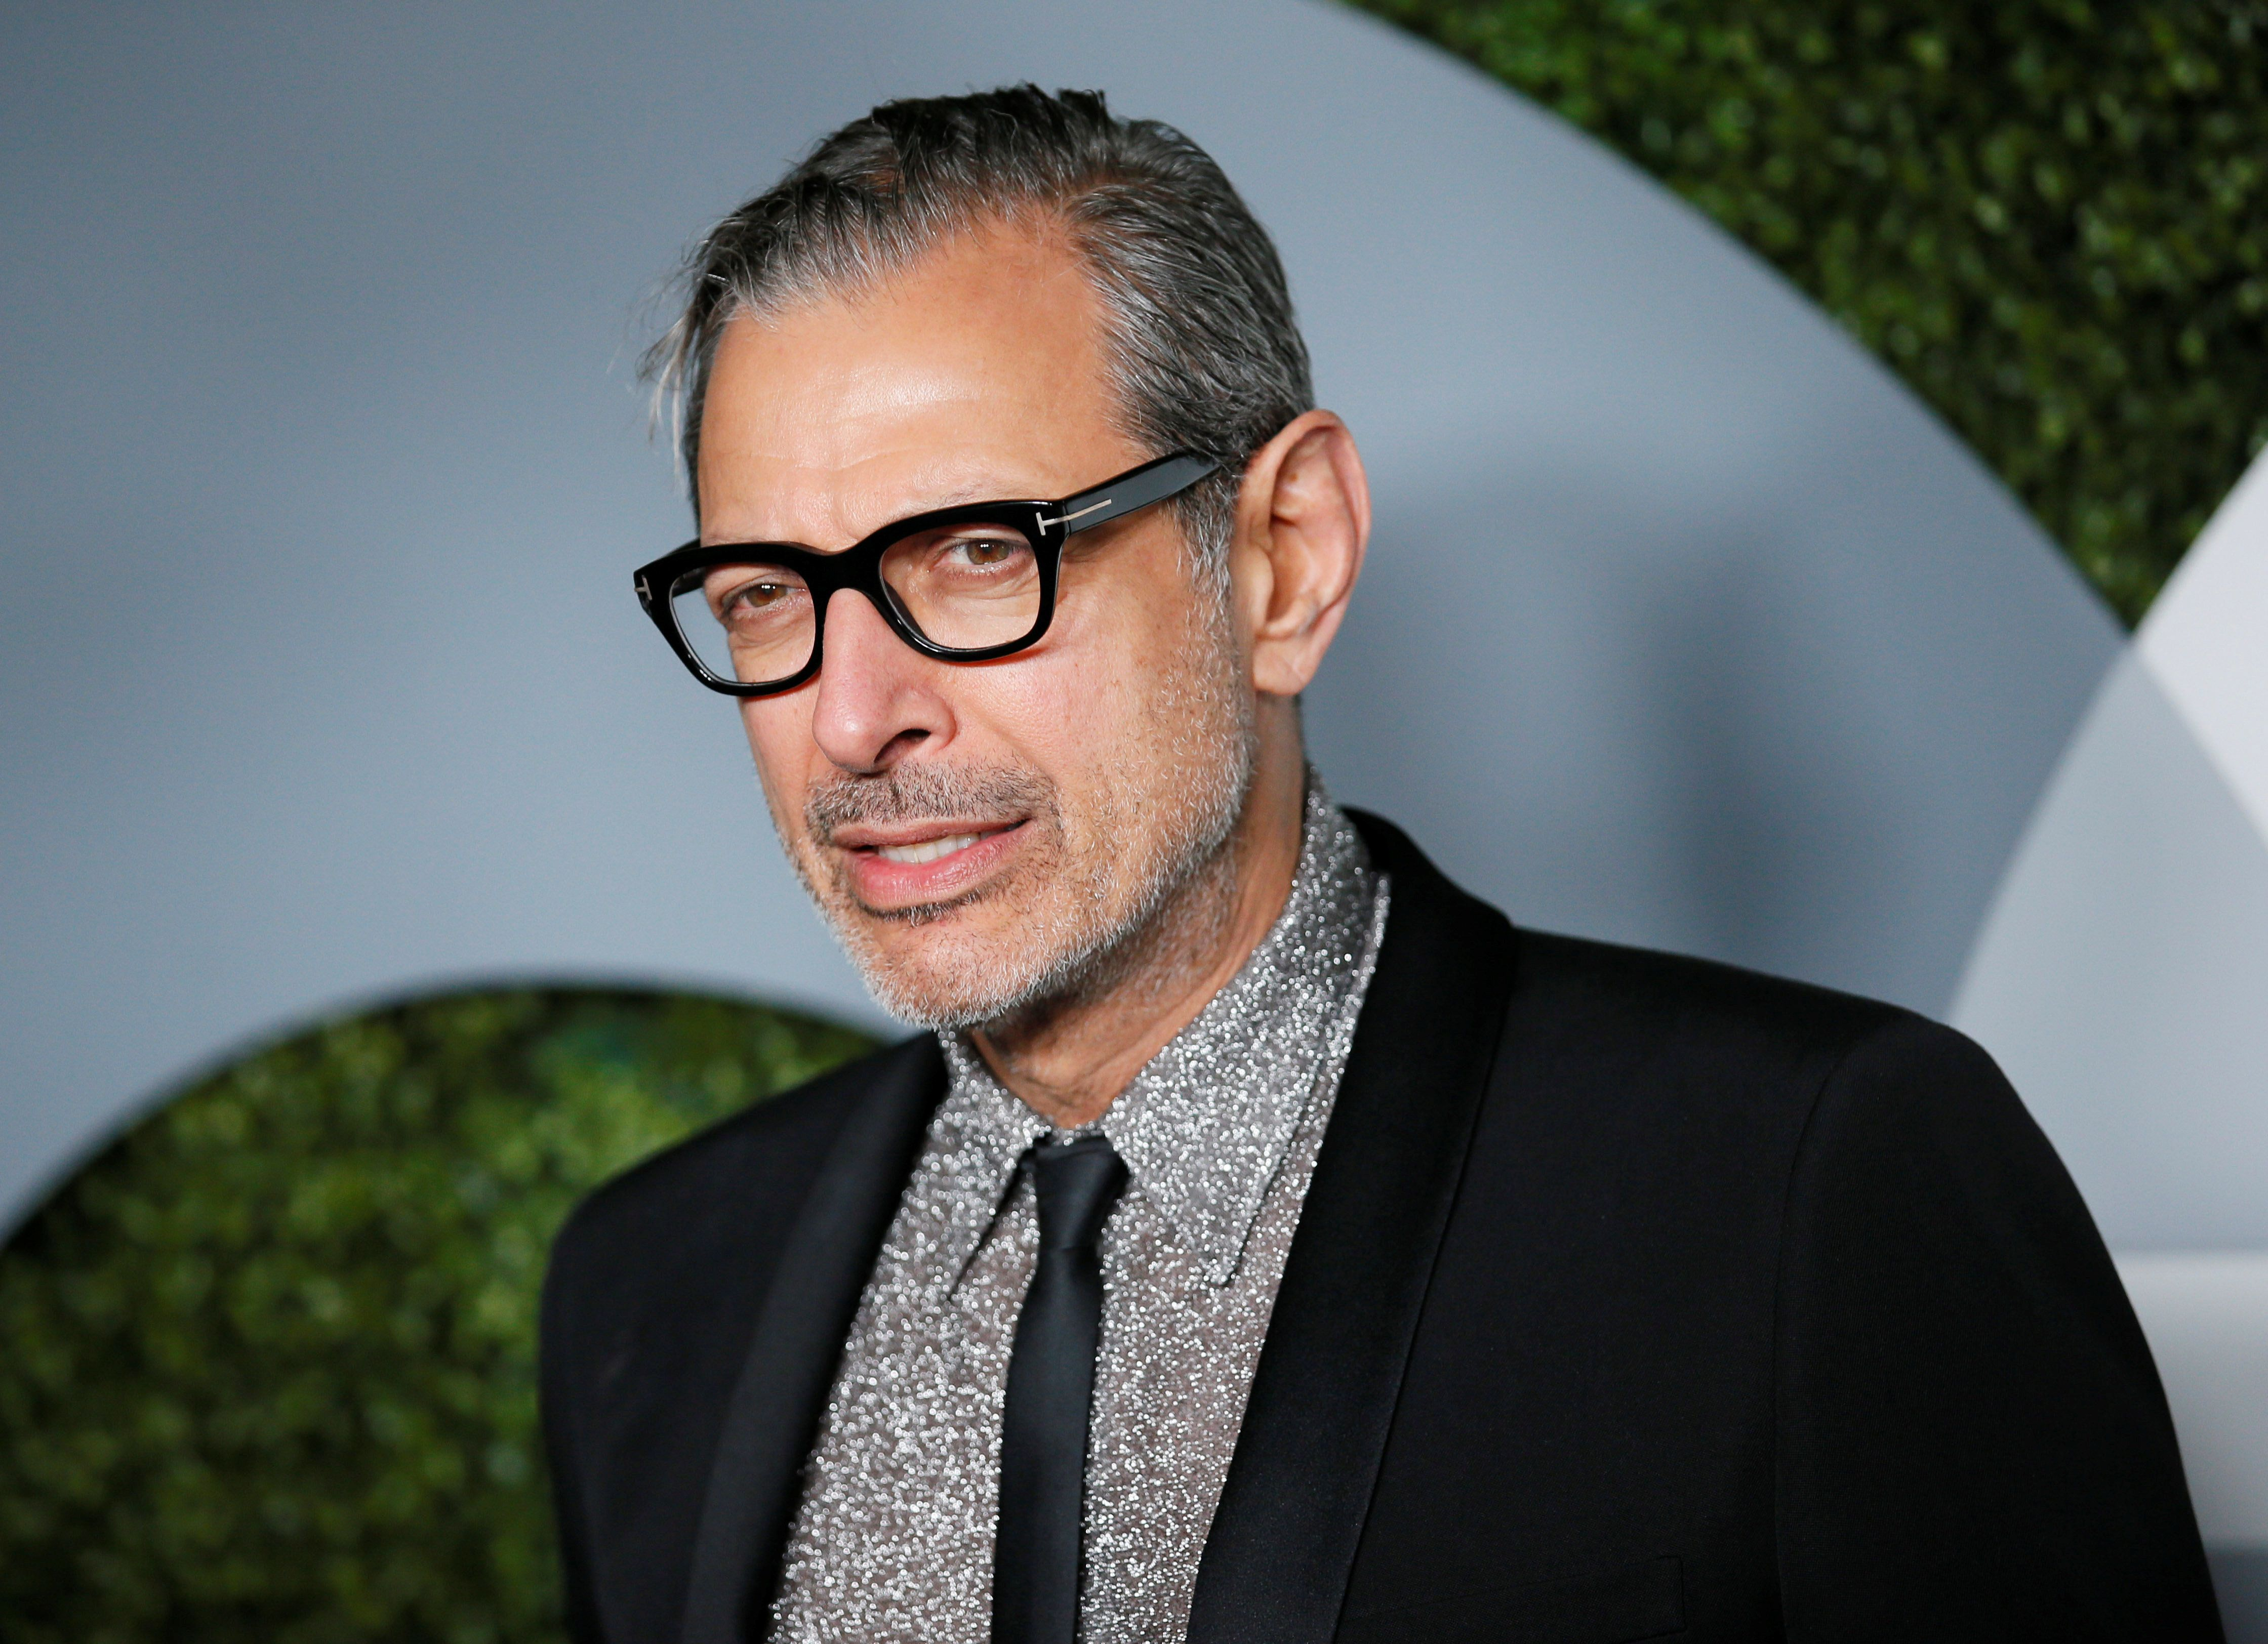 Jeff Goldblum To Reprise Role In \u0027Jurassic World\u0027 Sequel | HuffPost